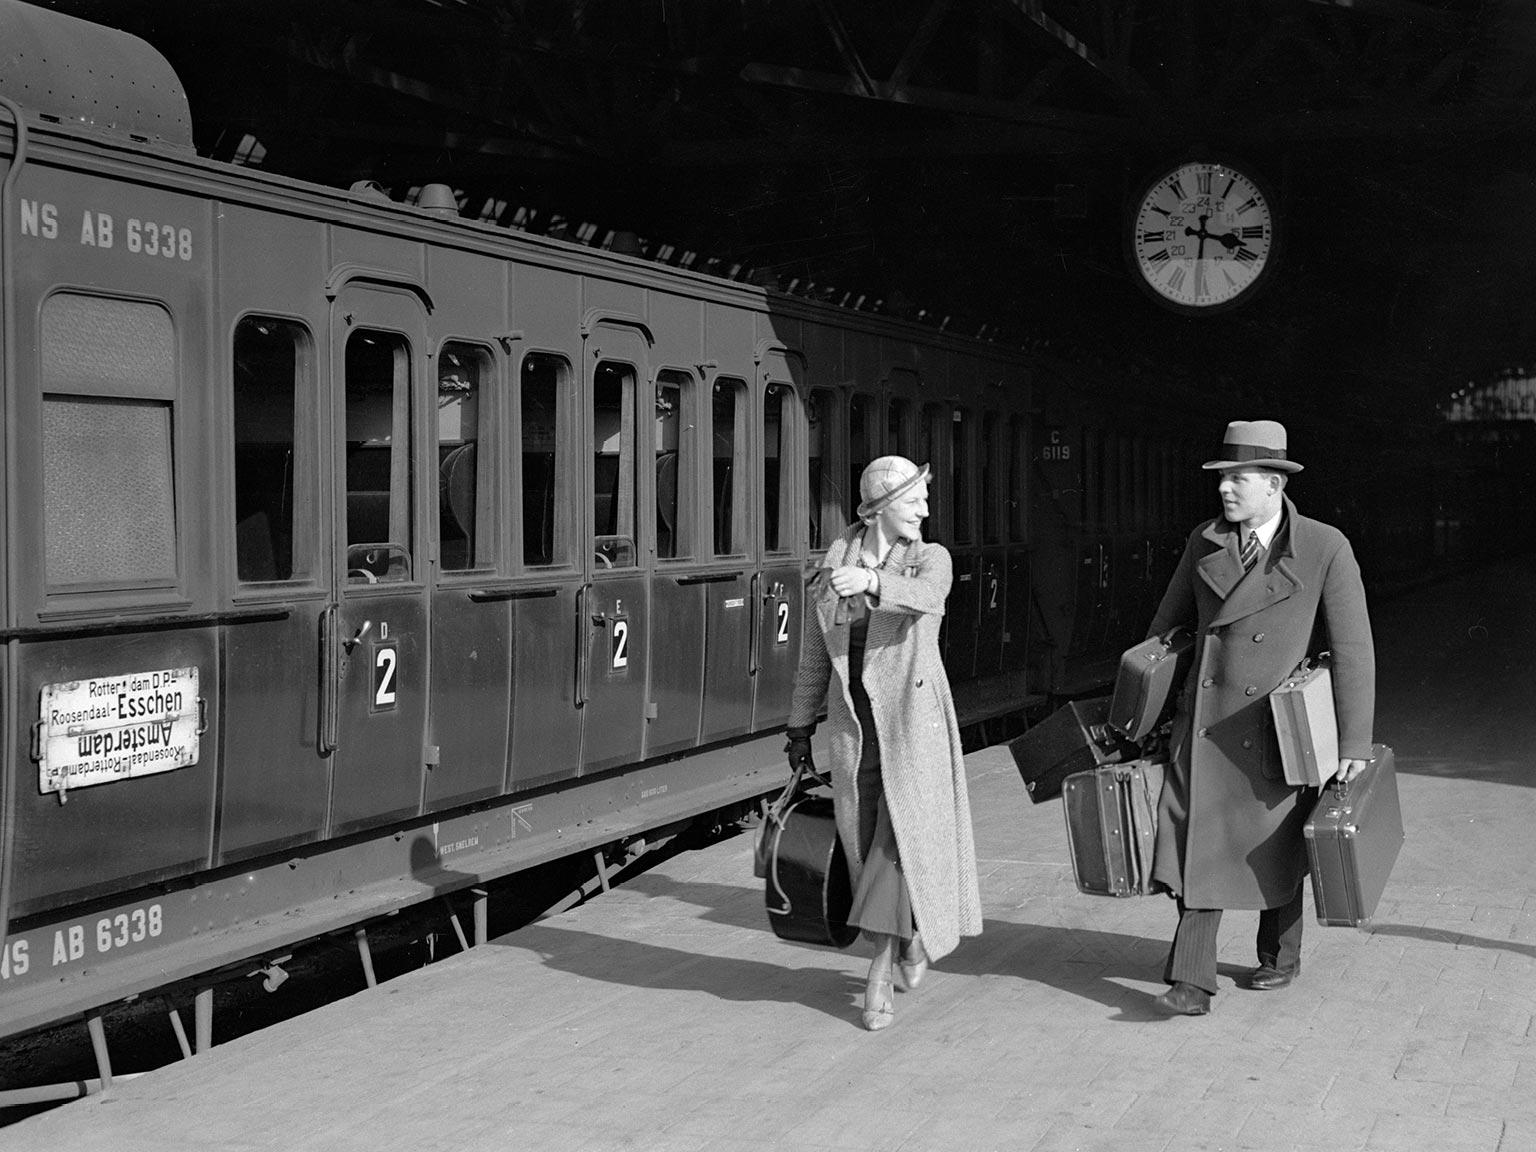 netherlands train system